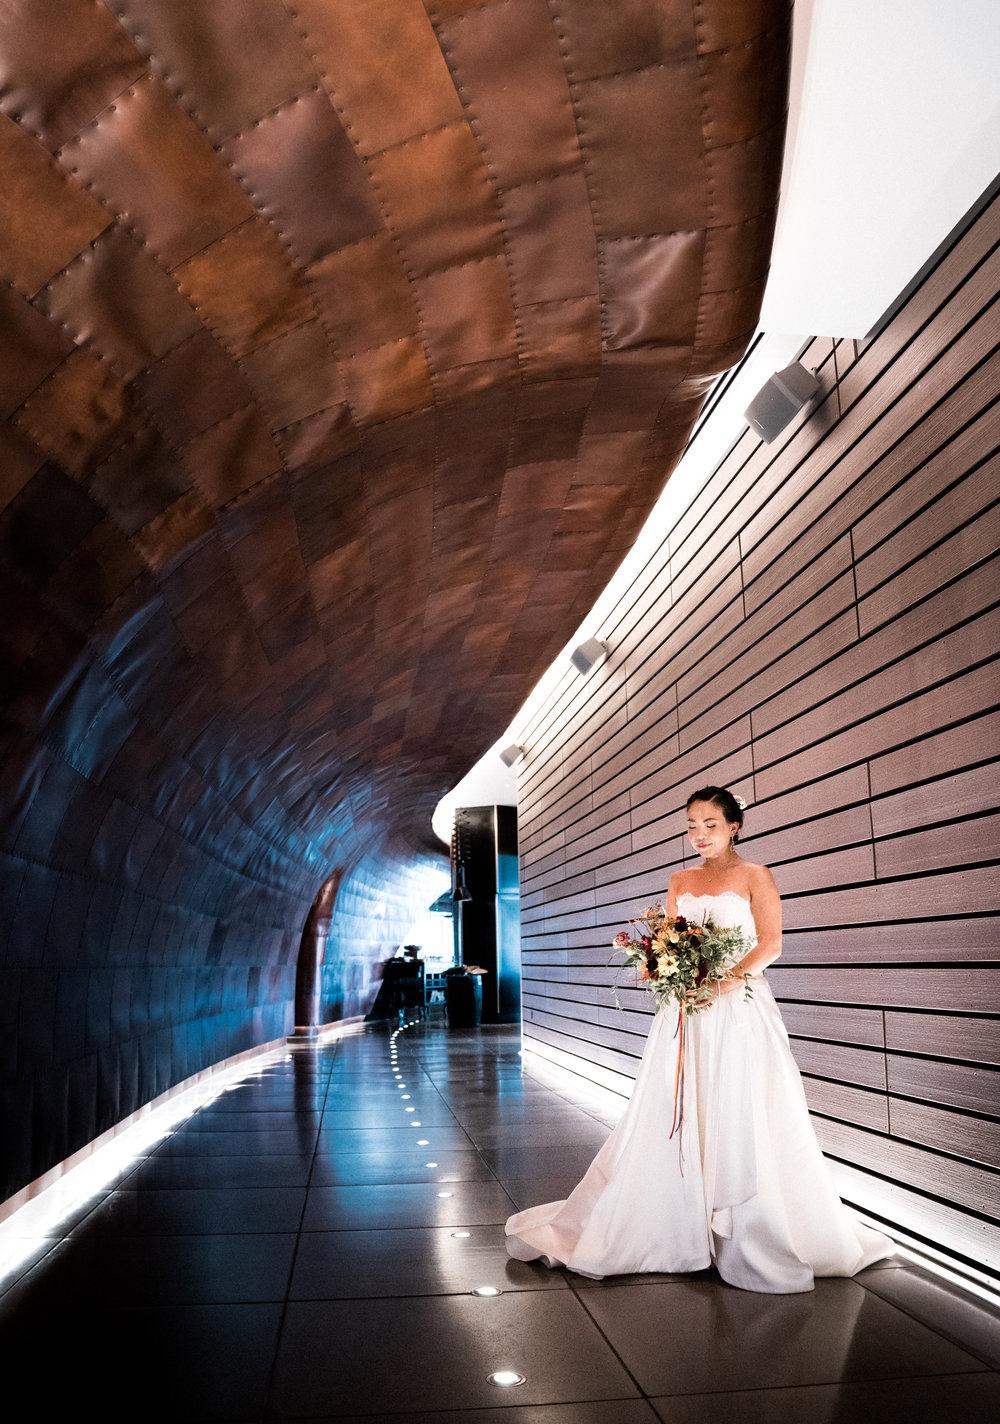 river-rooms-blackfriars-london-stpauls-mondrian-hotel-wedding-photography-videography-22